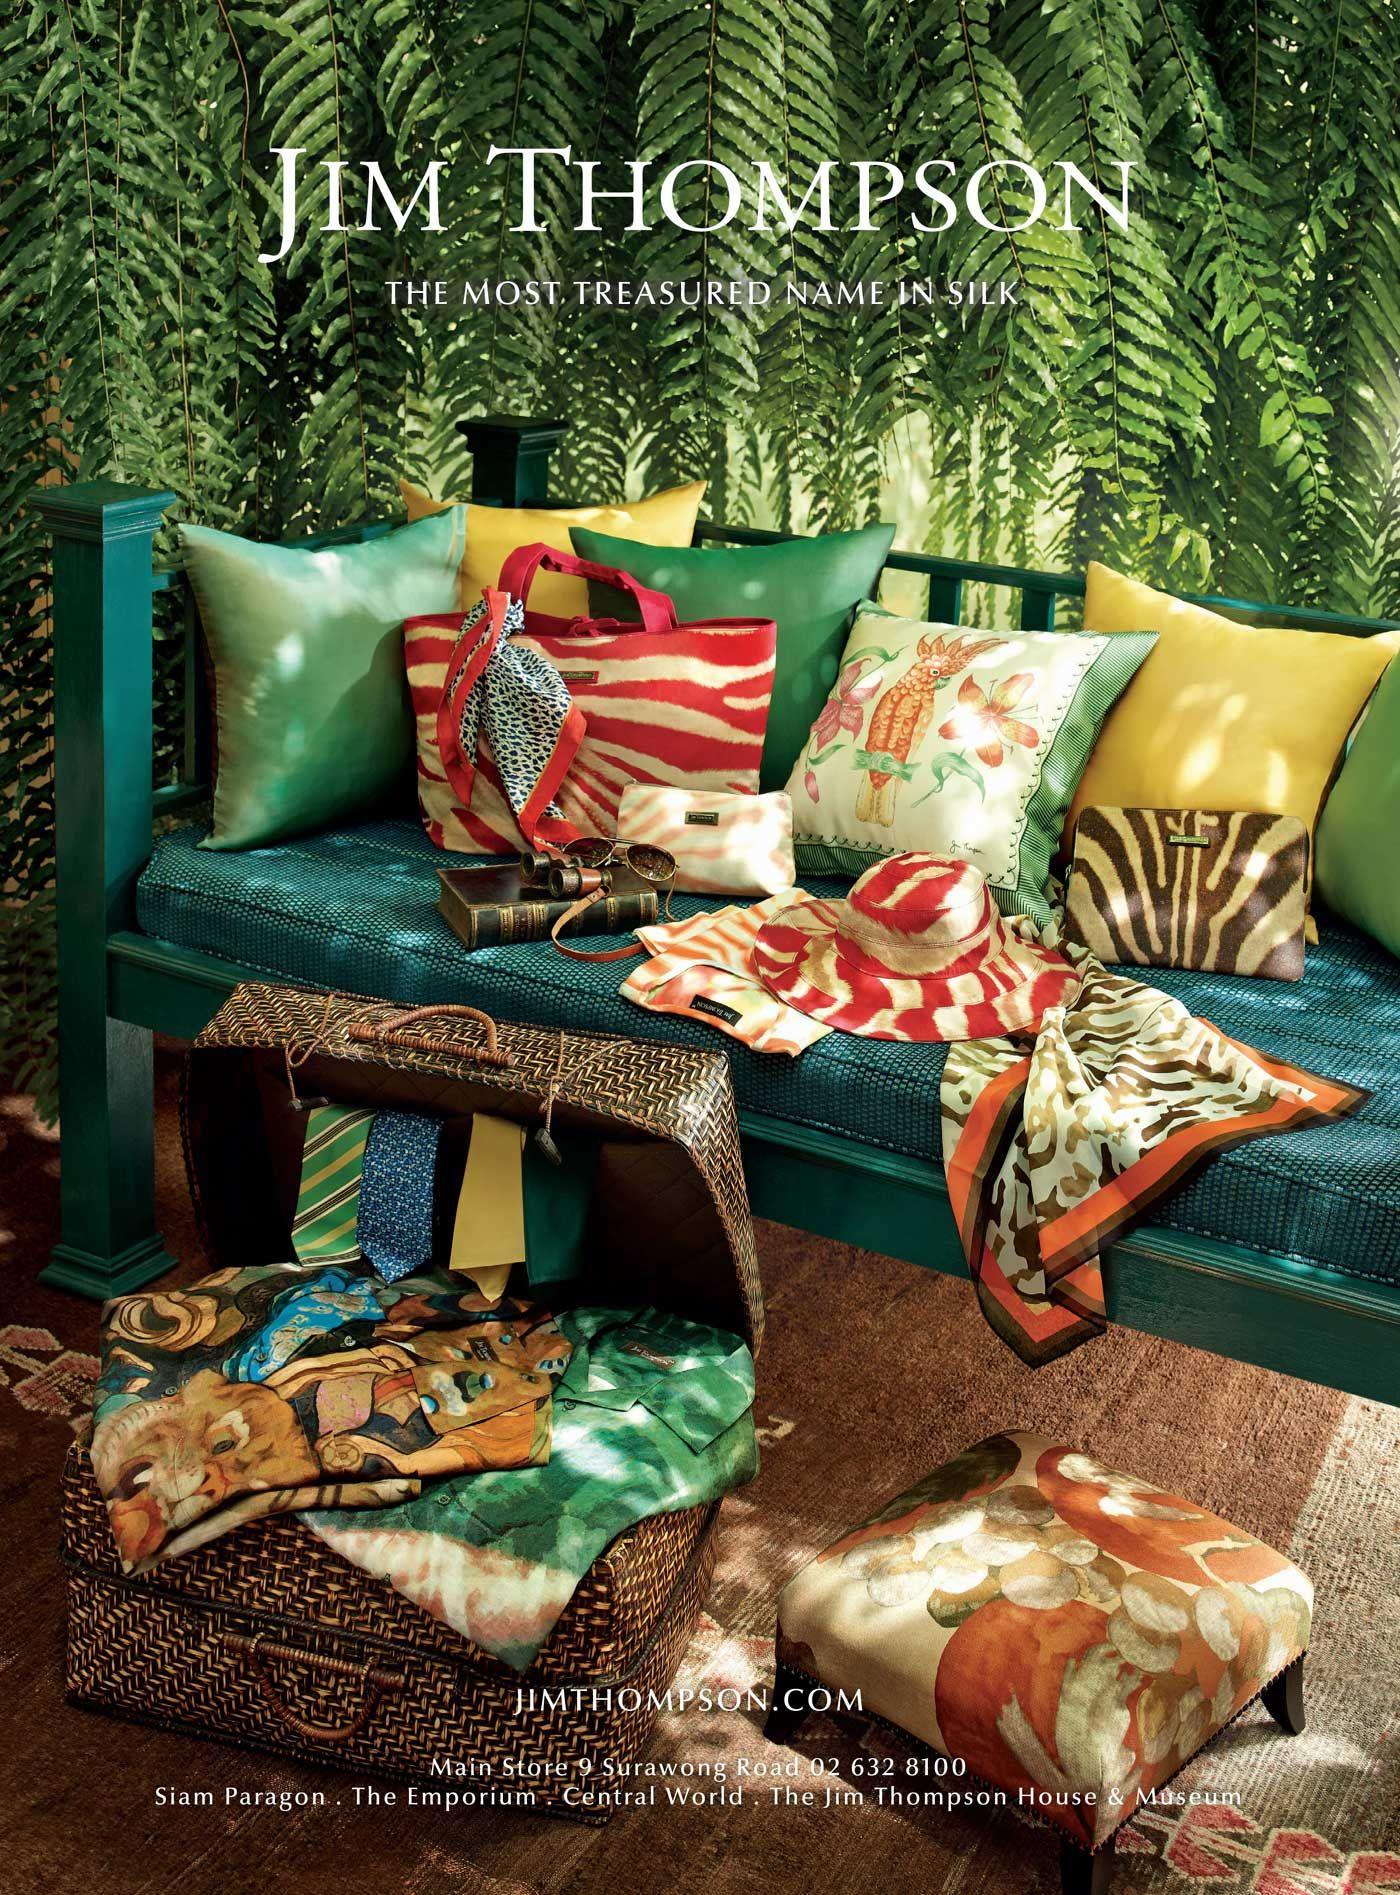 Jim Thompson Thailand Advertising Campaign Fabrics